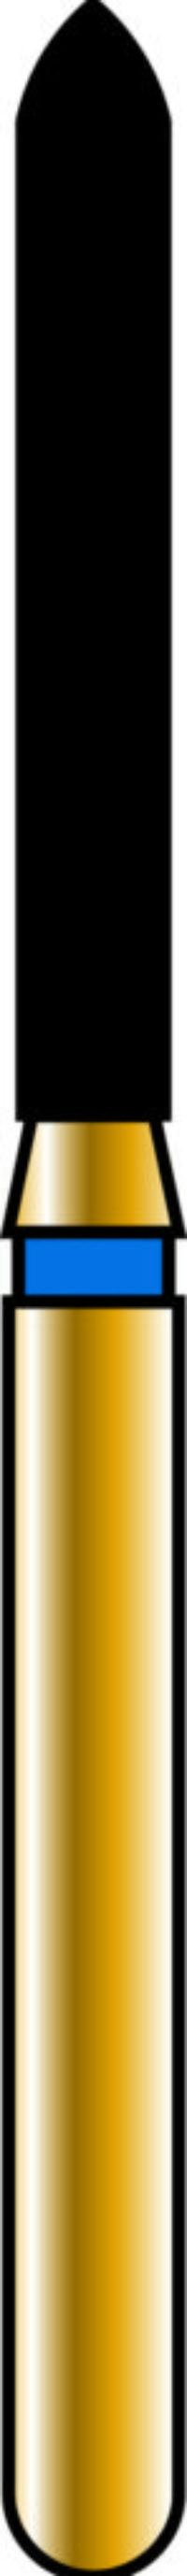 Pointed Cylinder 14-10mm Gold Diamond Bur